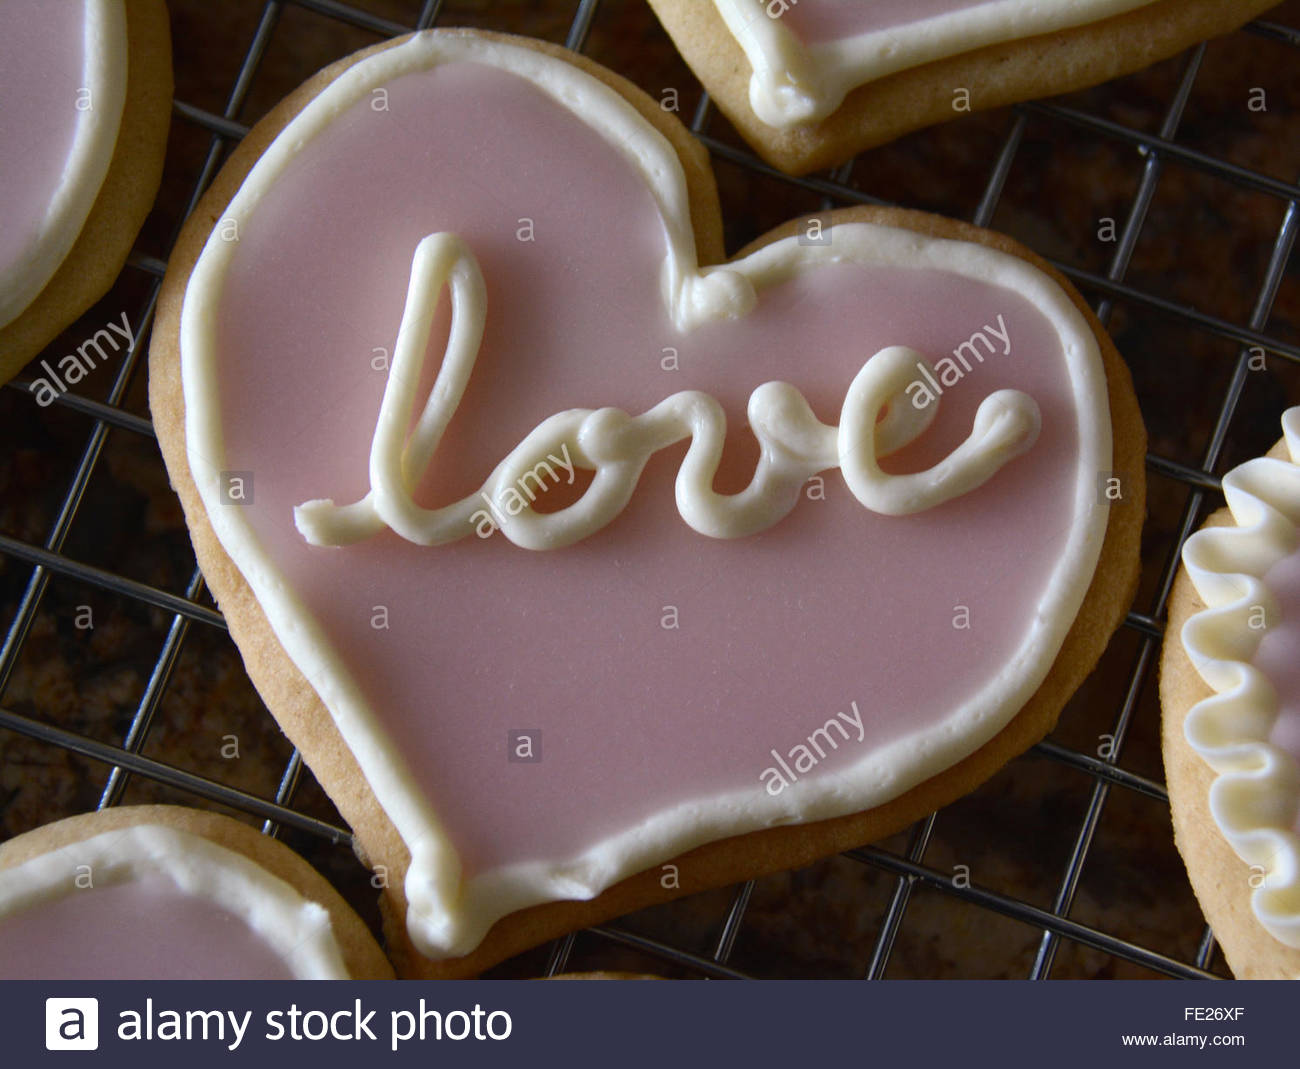 Valentine Love Sugar Cookie - Stock Image